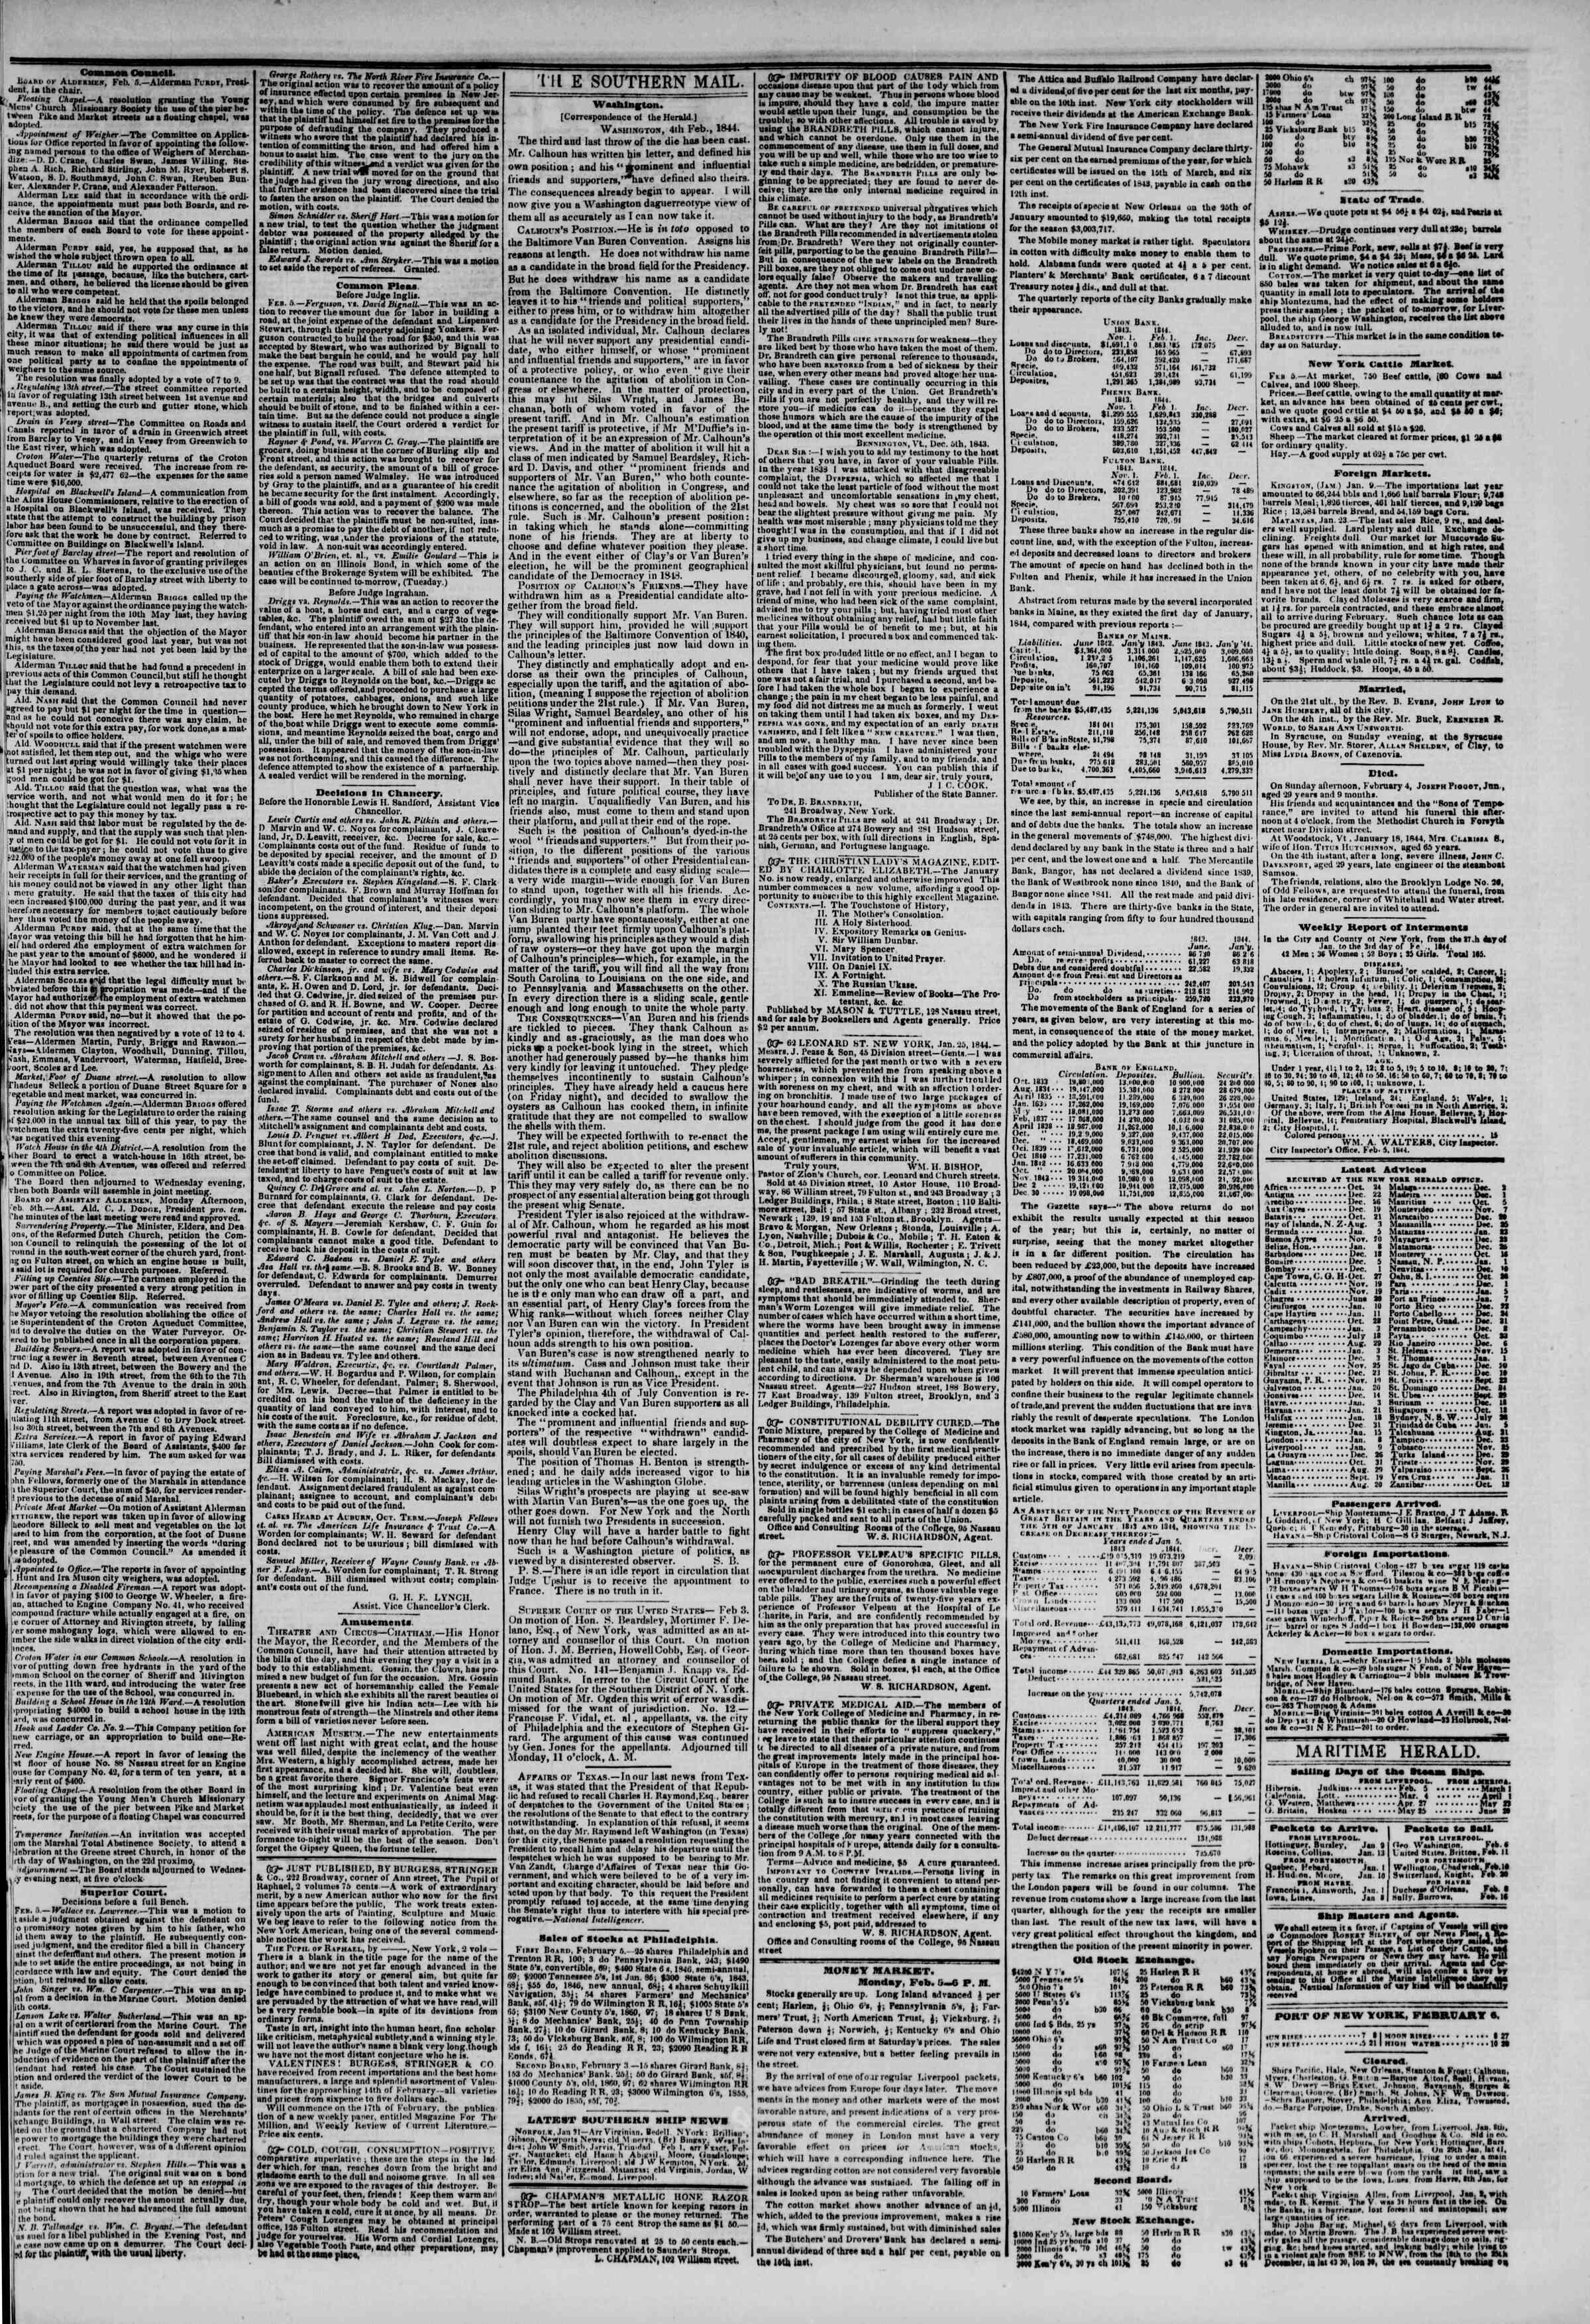 February 6, 1844 Tarihli The New York Herald Gazetesi Sayfa 3